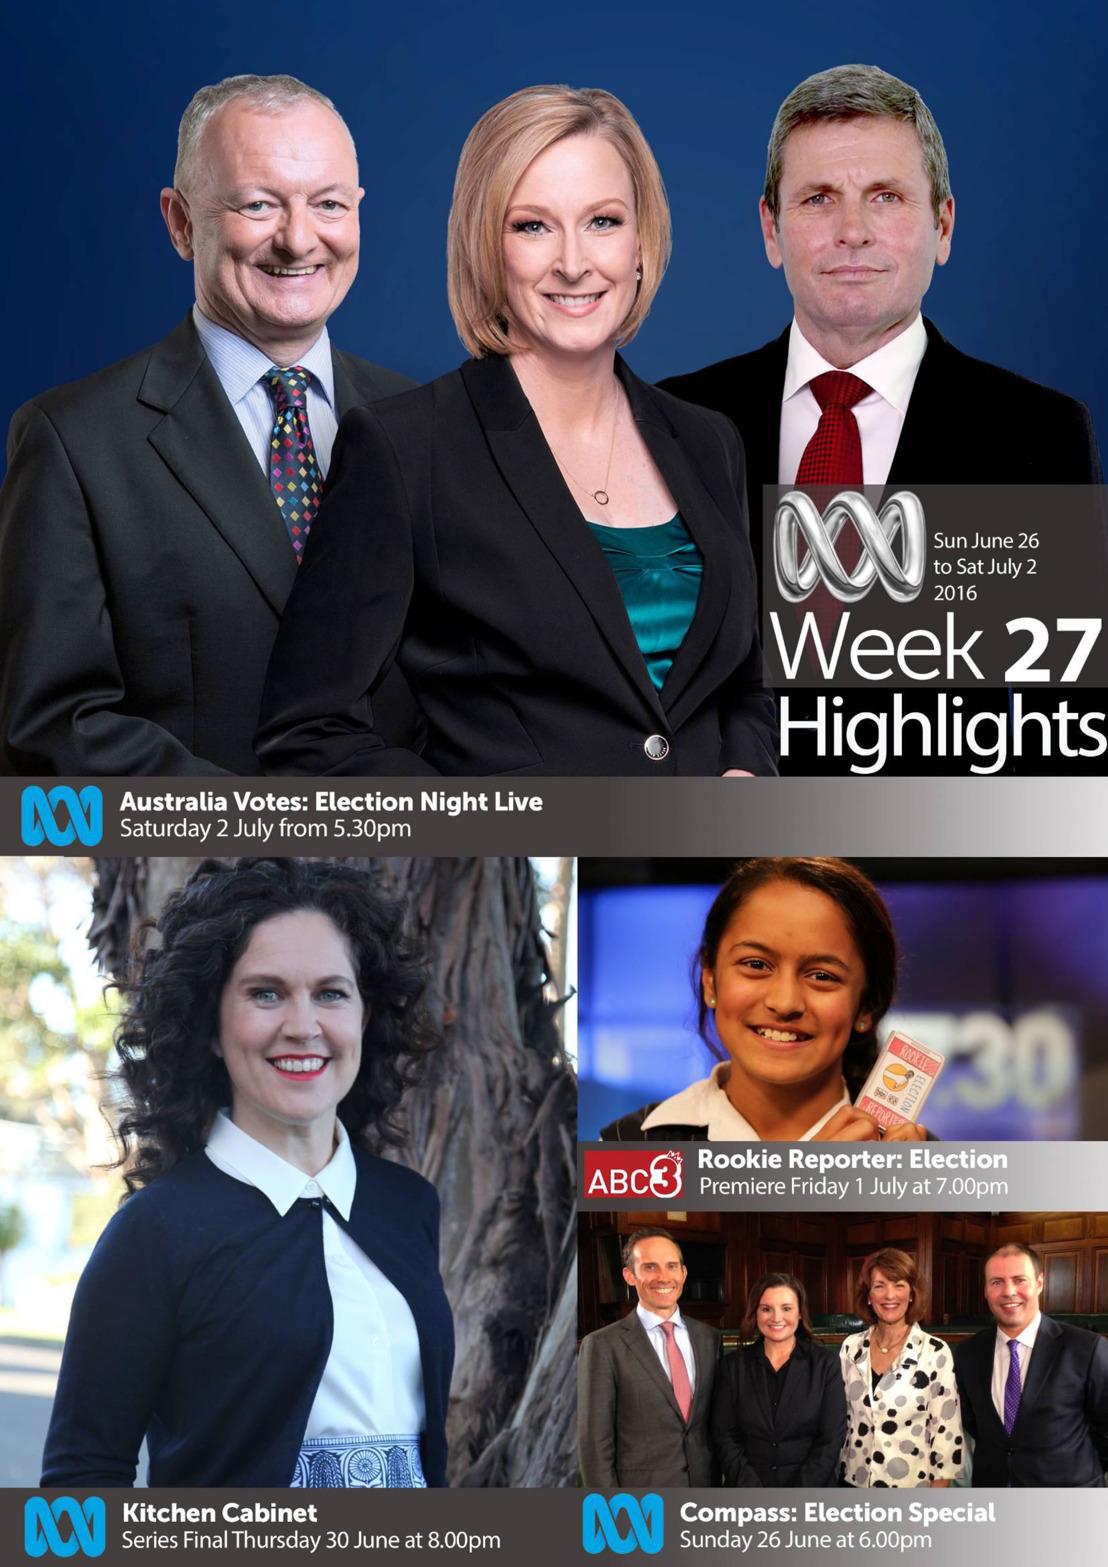 ABC Program Highlights - Week 27